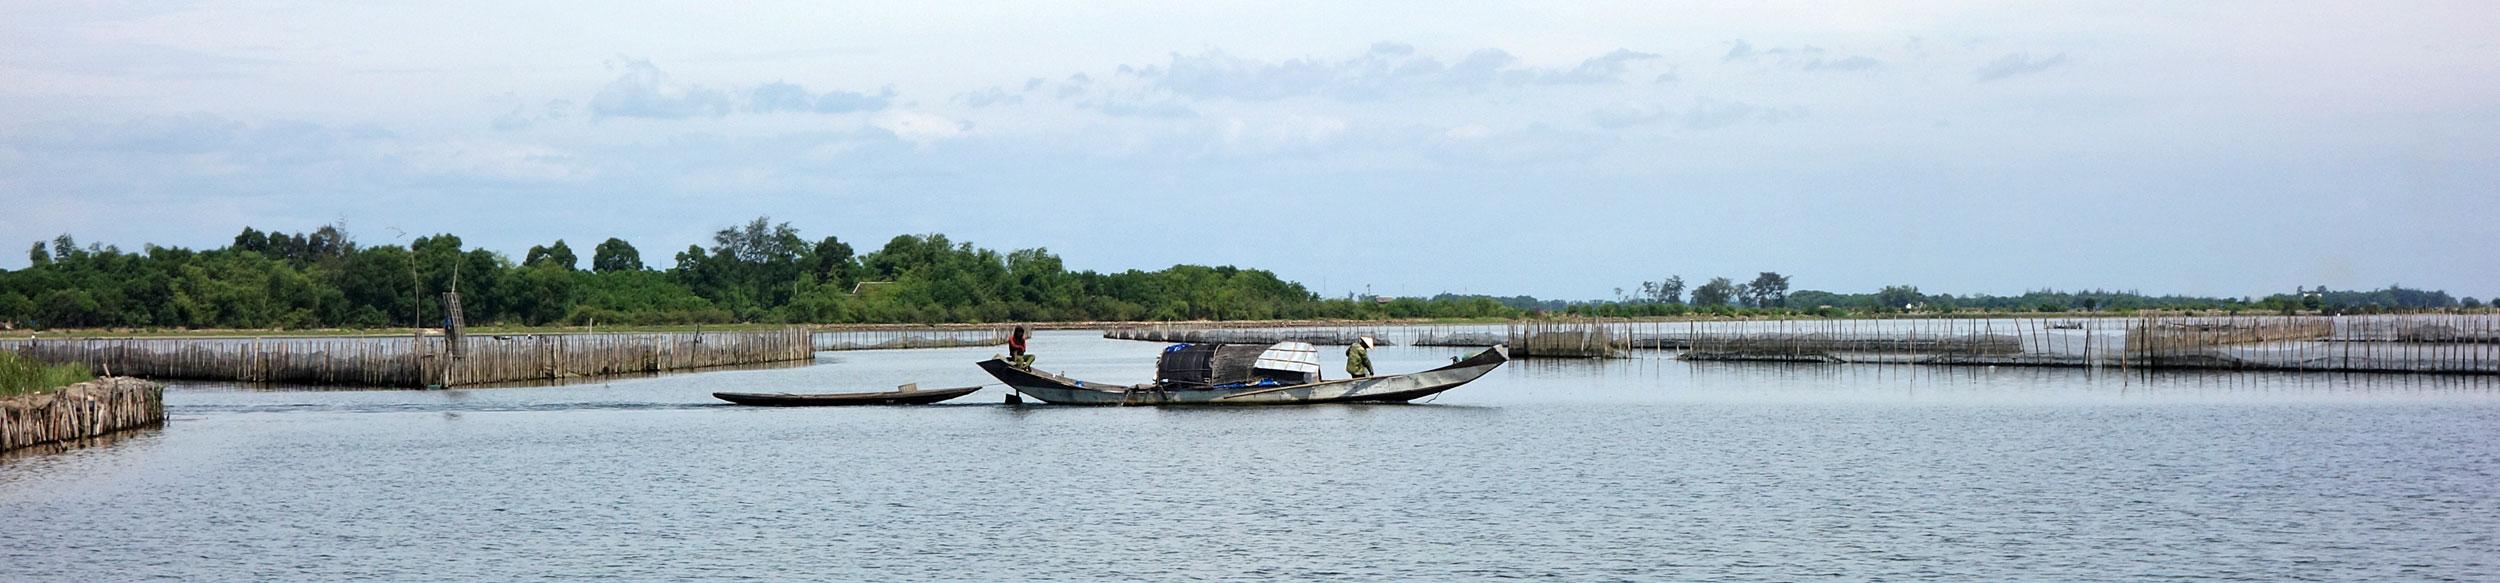 Sampan dans la lagune de Tam Giang au centre Vietnam